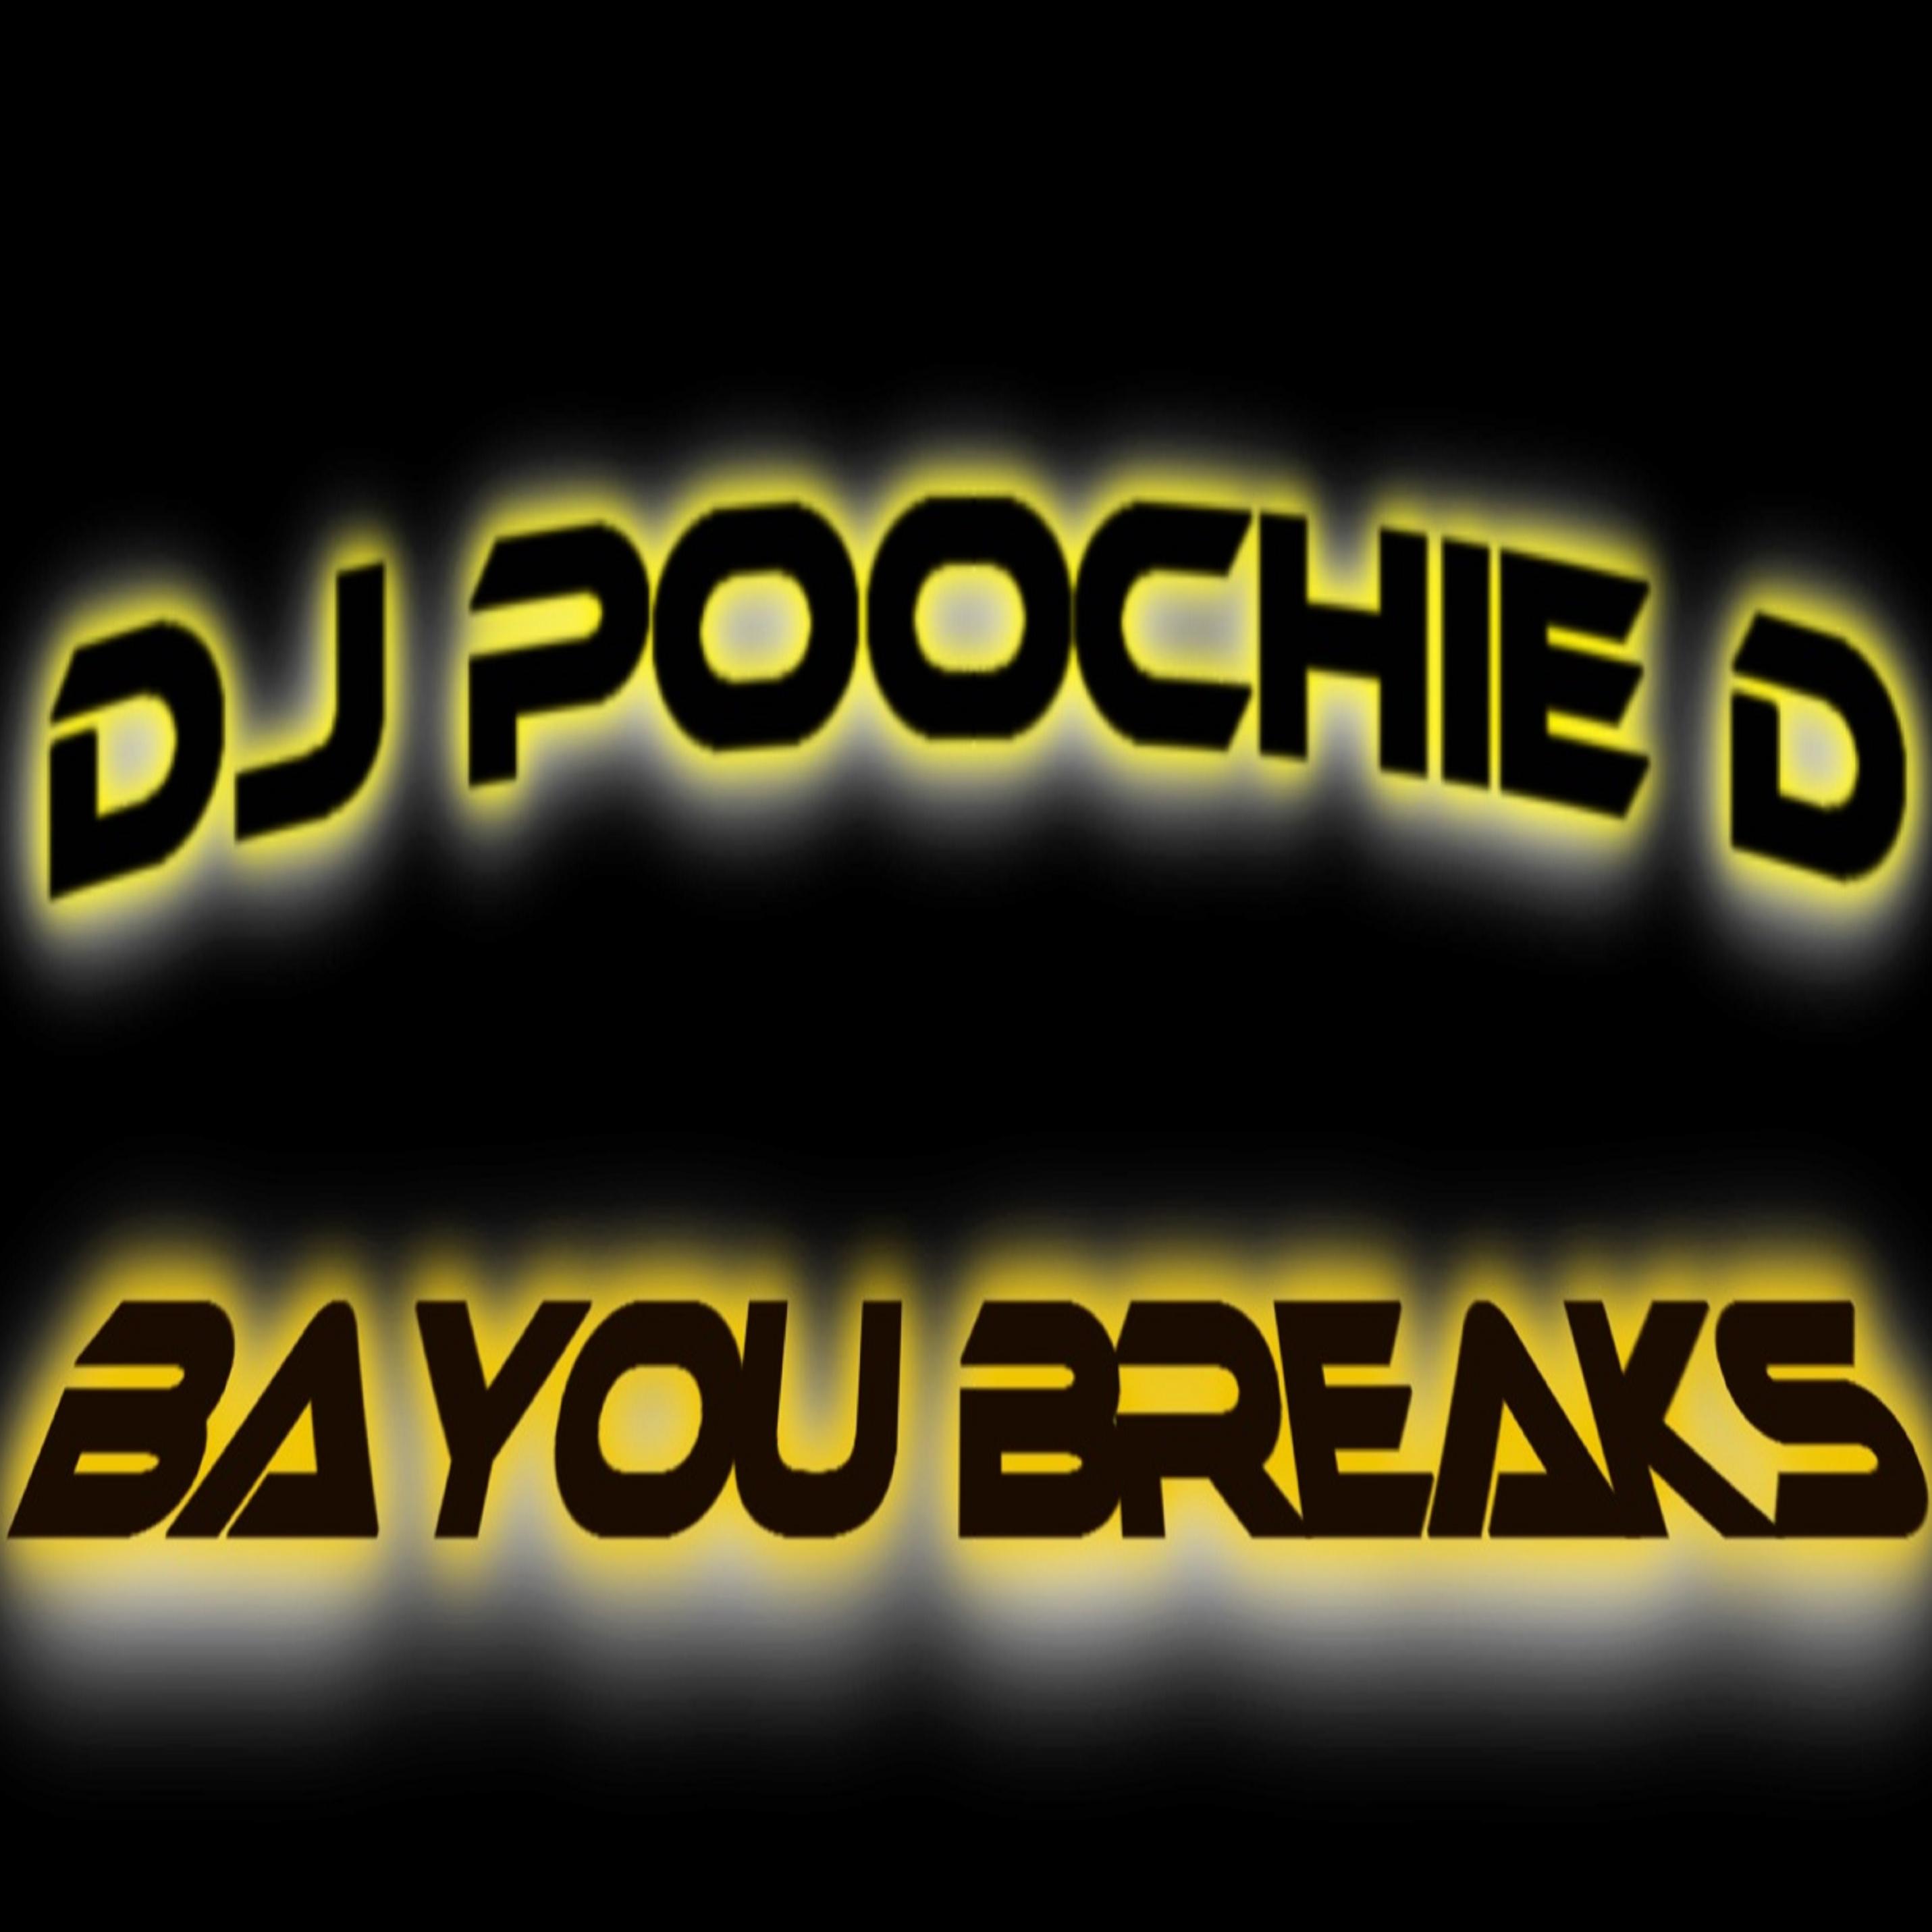 Bayou Breaks